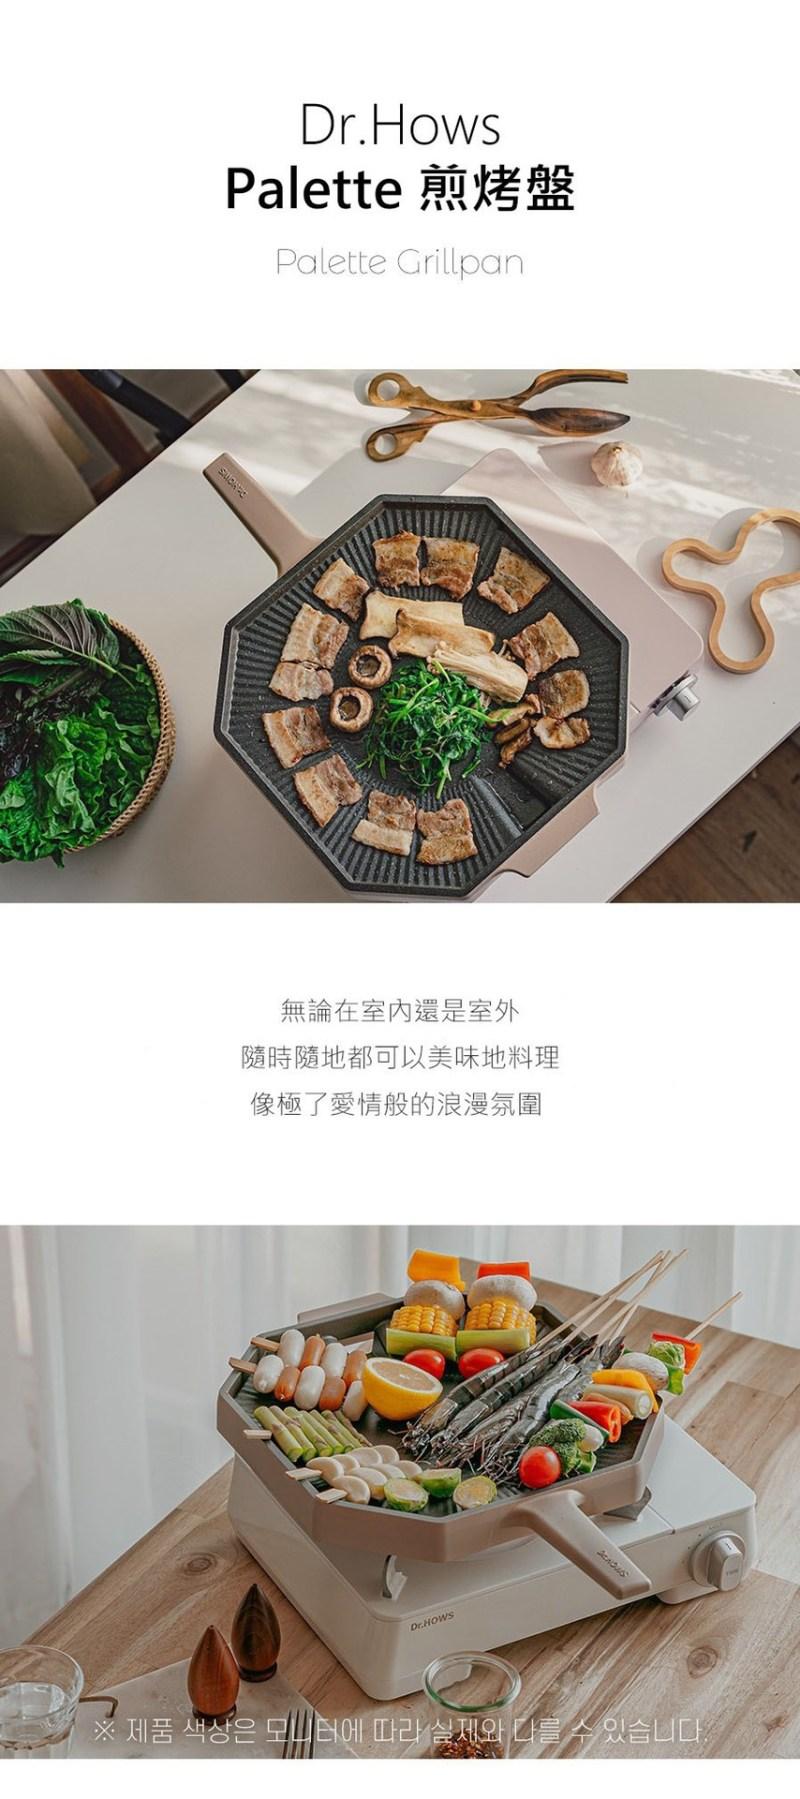 Dr.Hows-Palette 煎烤盤